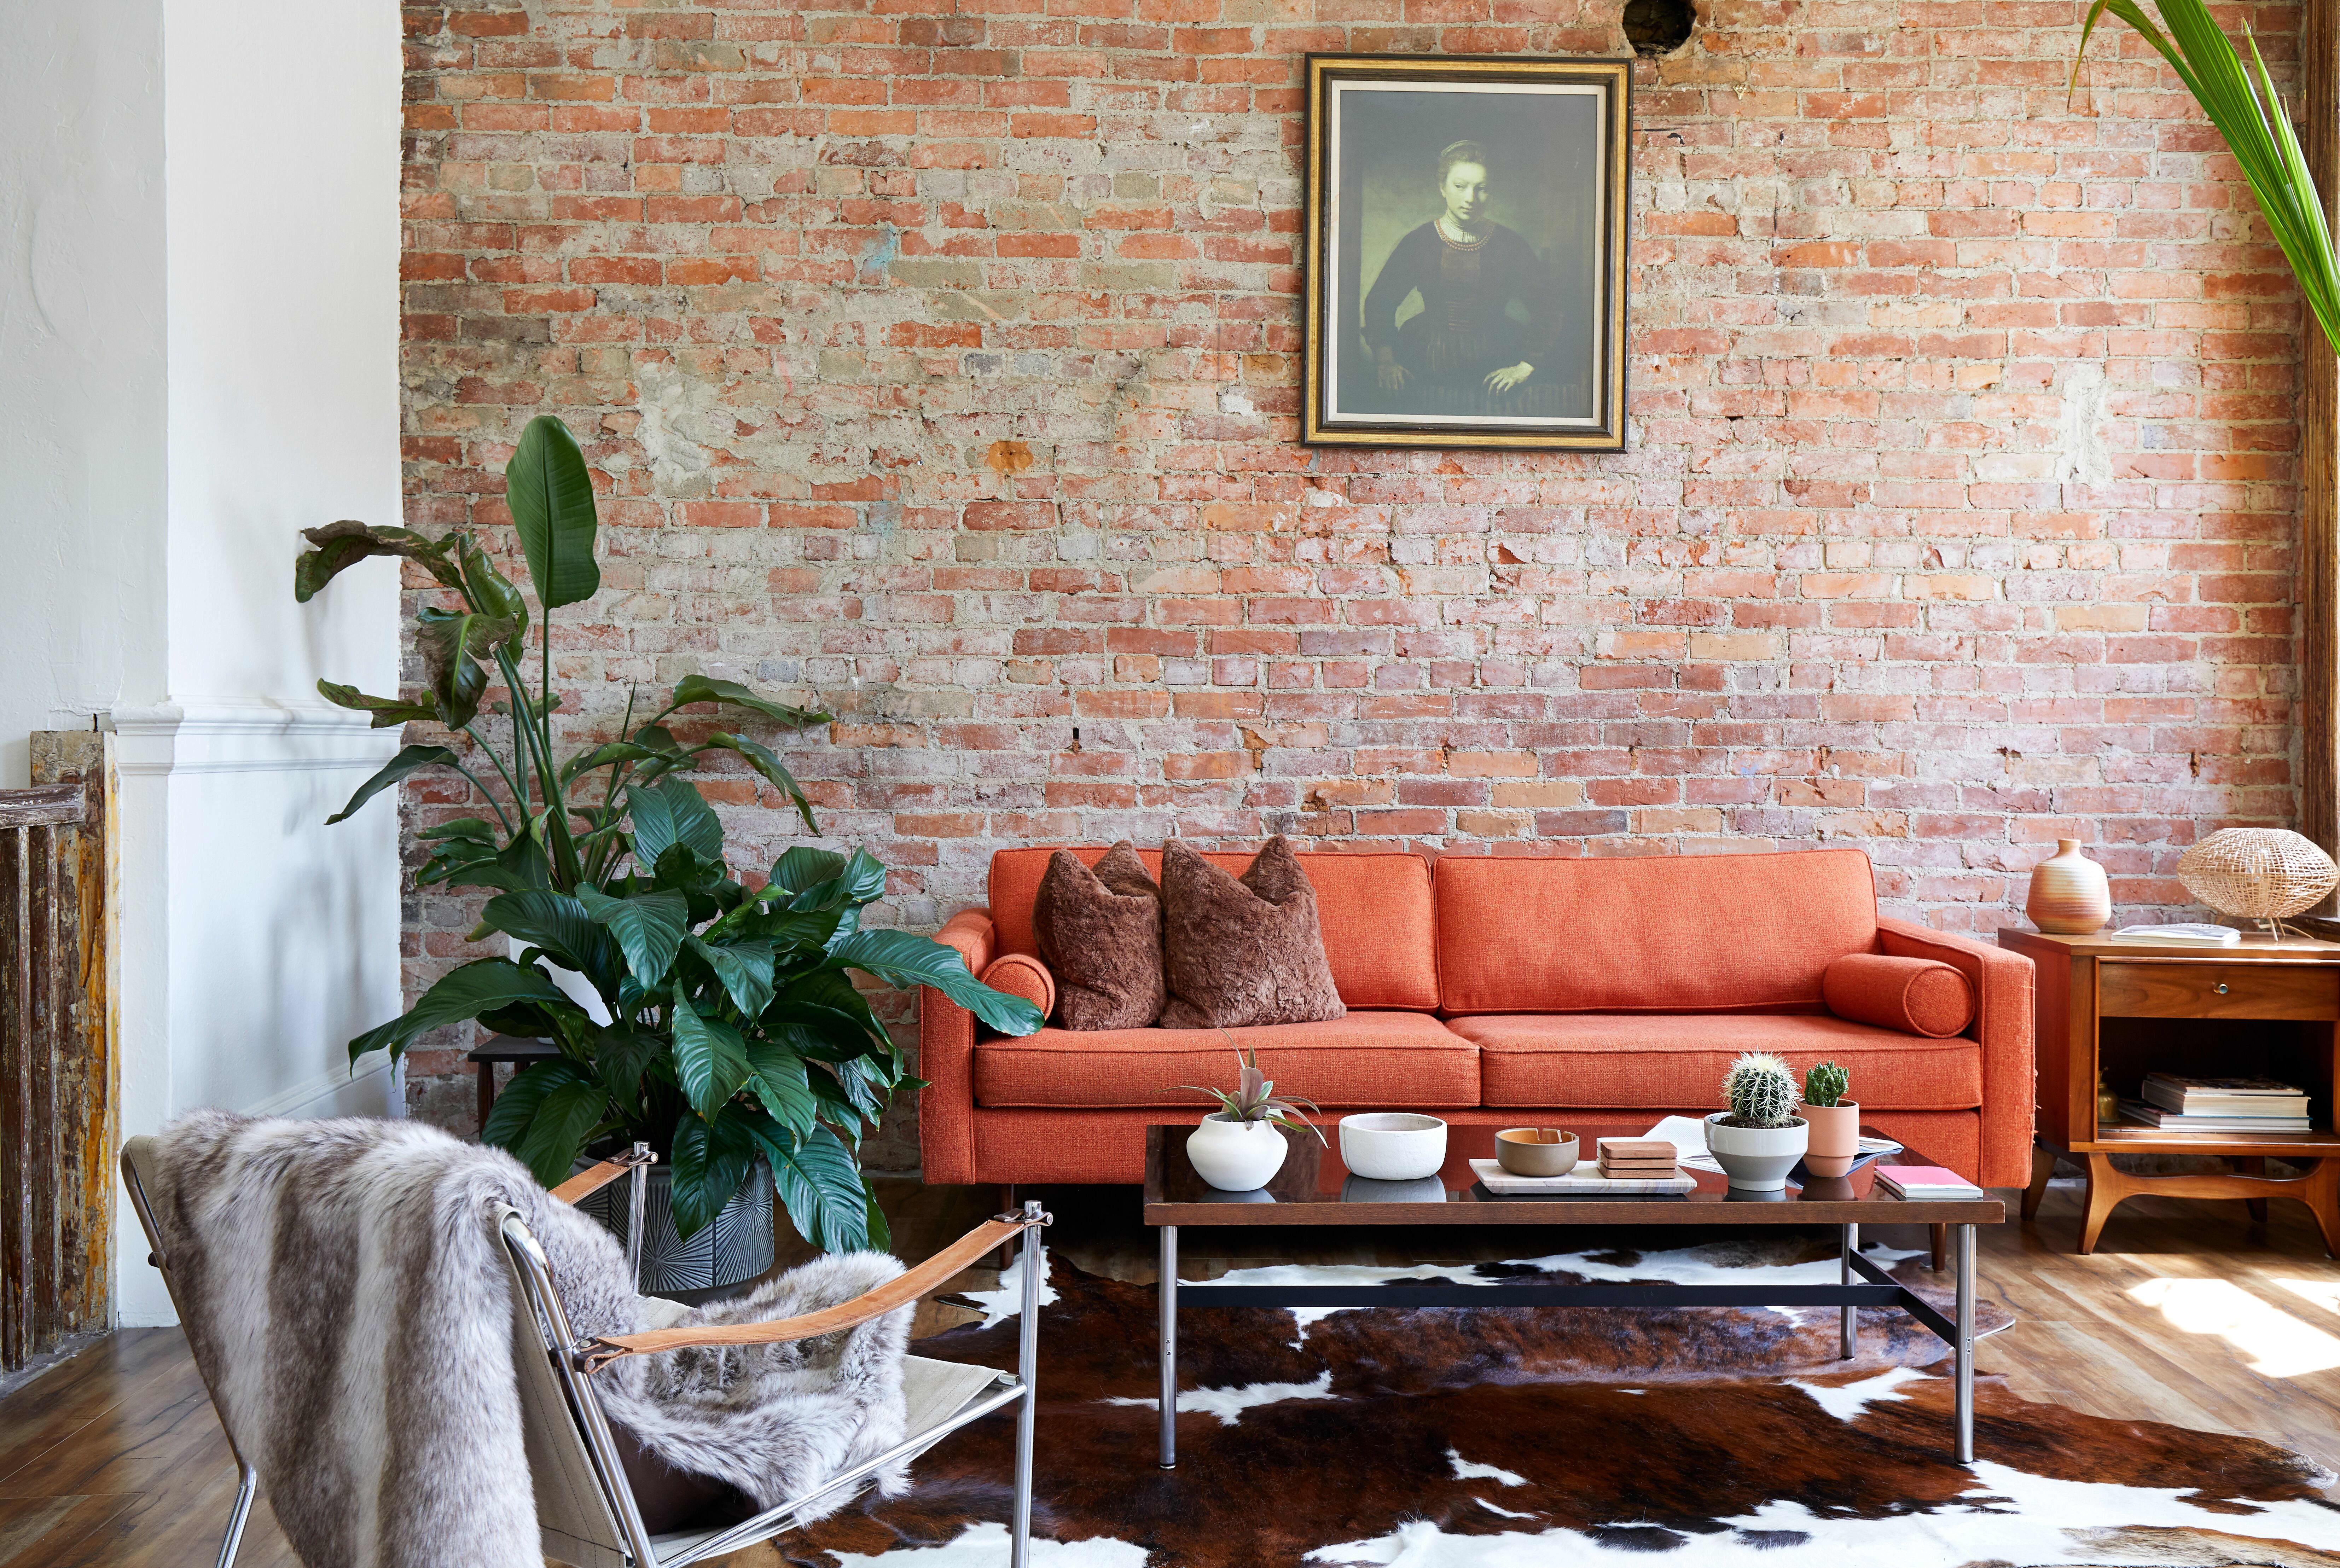 Swell Mid Century Modern Desert Inspired Seattle Loft Tour Machost Co Dining Chair Design Ideas Machostcouk